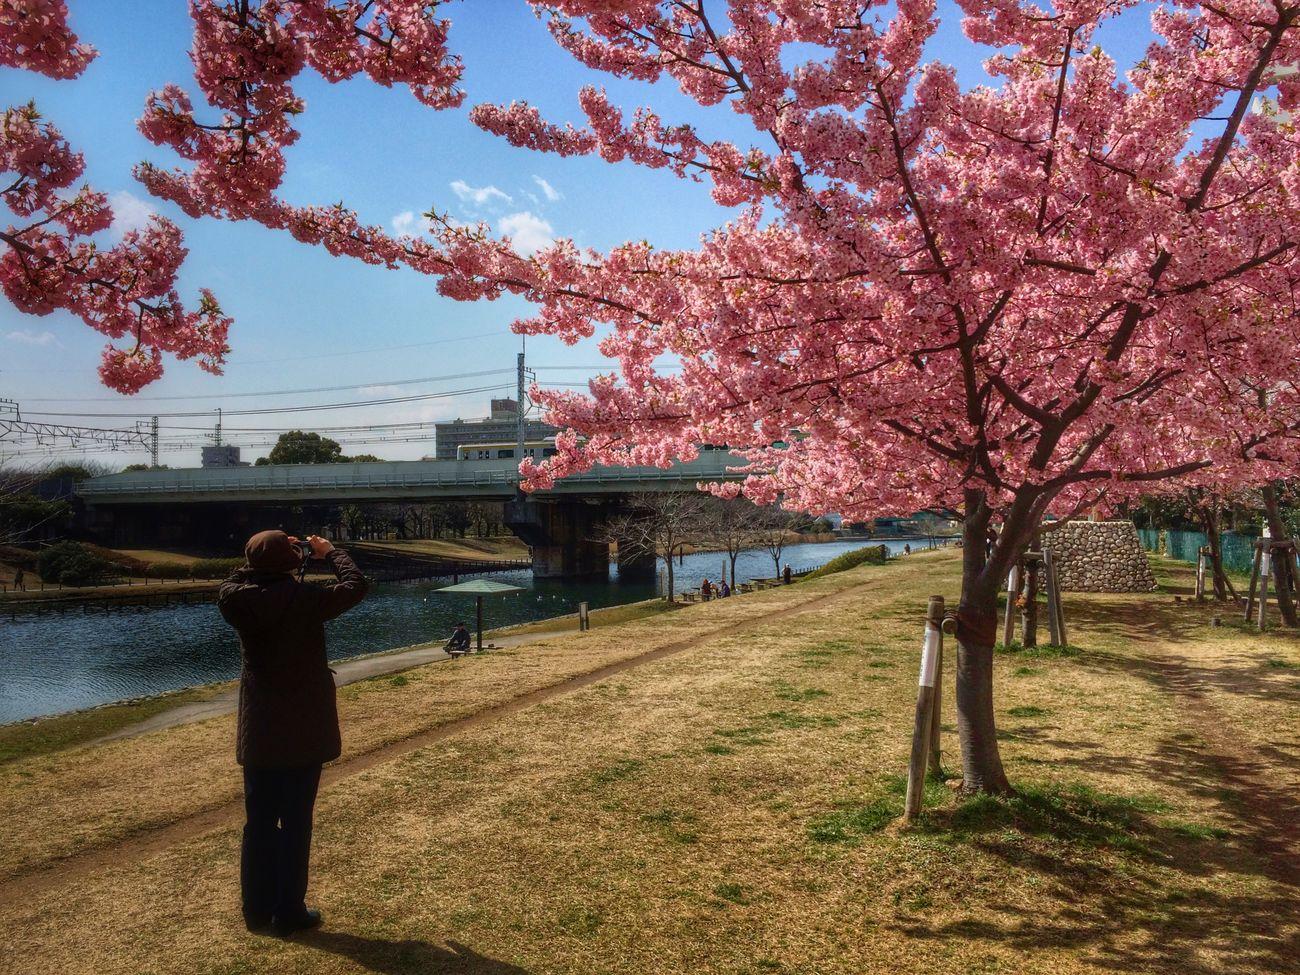 Kawazu-zakura Springtime Tadaa Community 500px 向けに選んだベストショットは、結局、この5s撮りだったりする (^^;